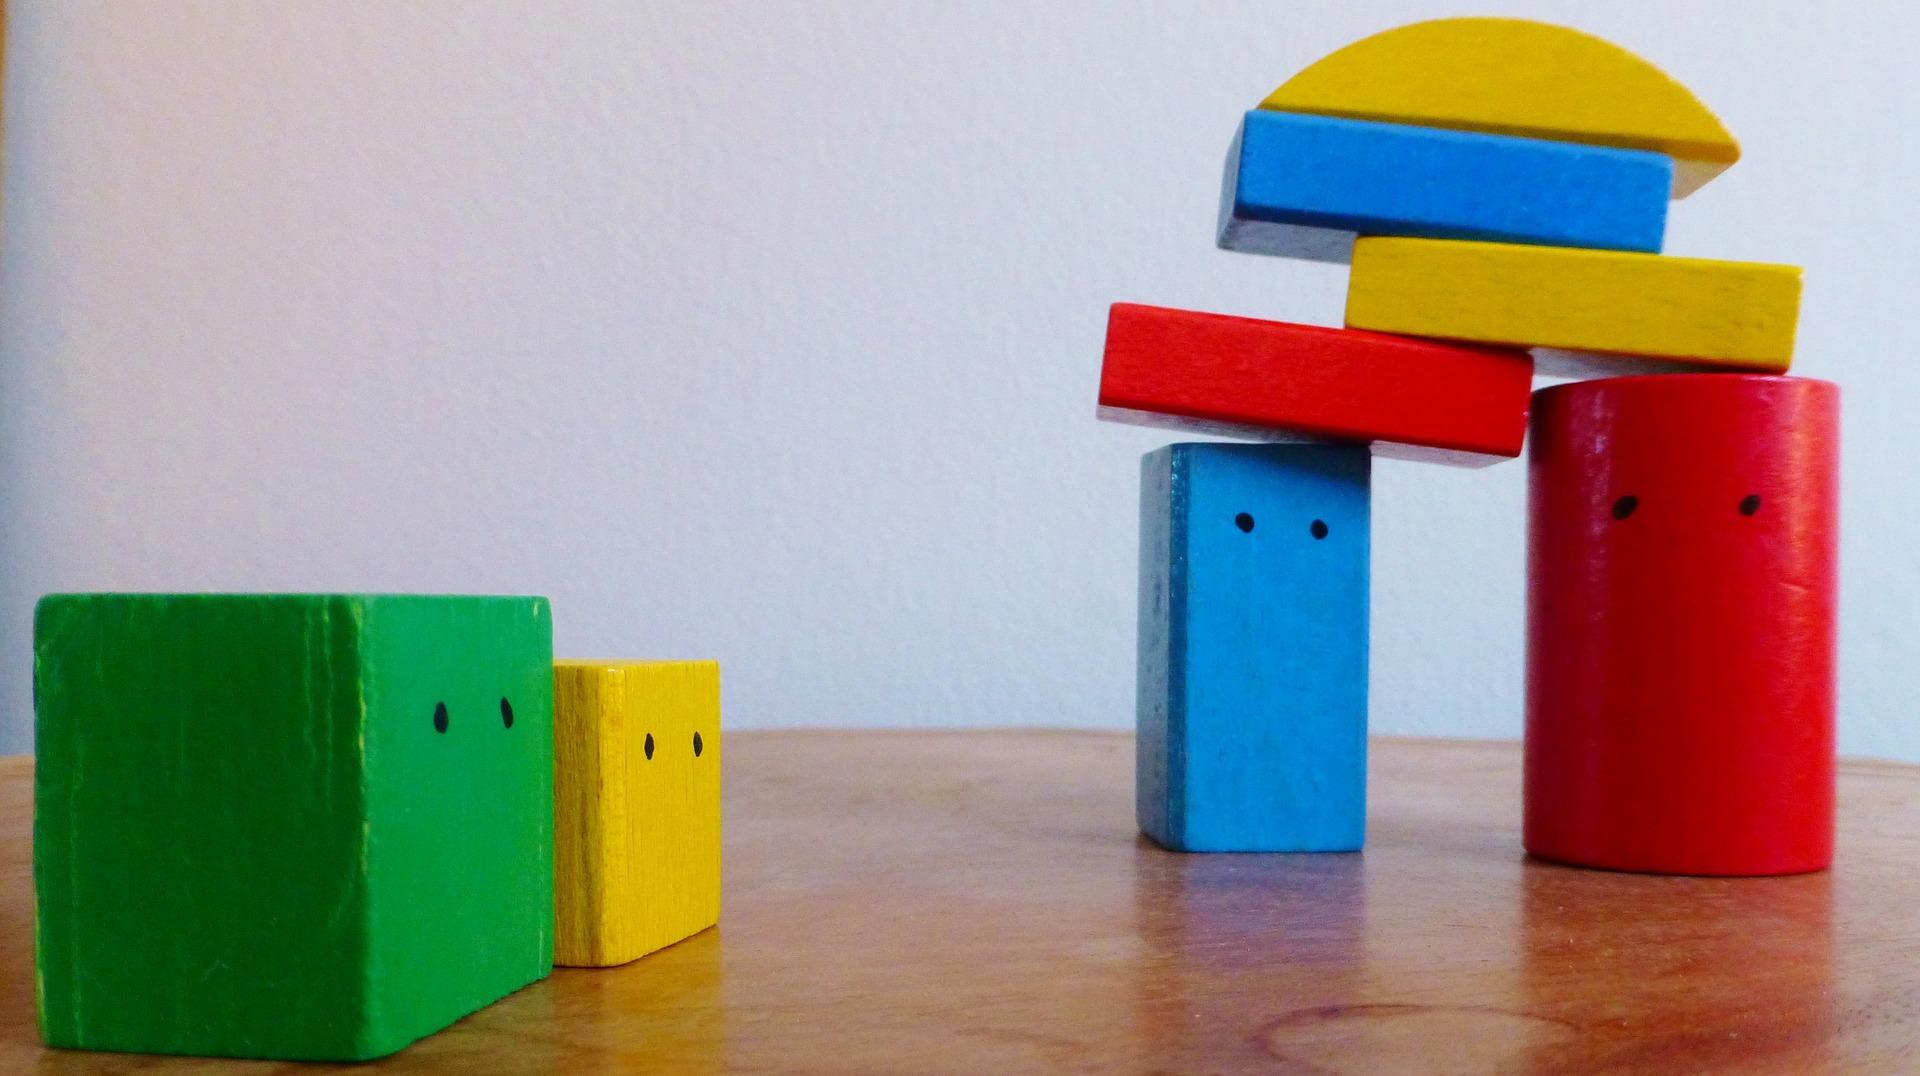 building-blocks-456616_1920